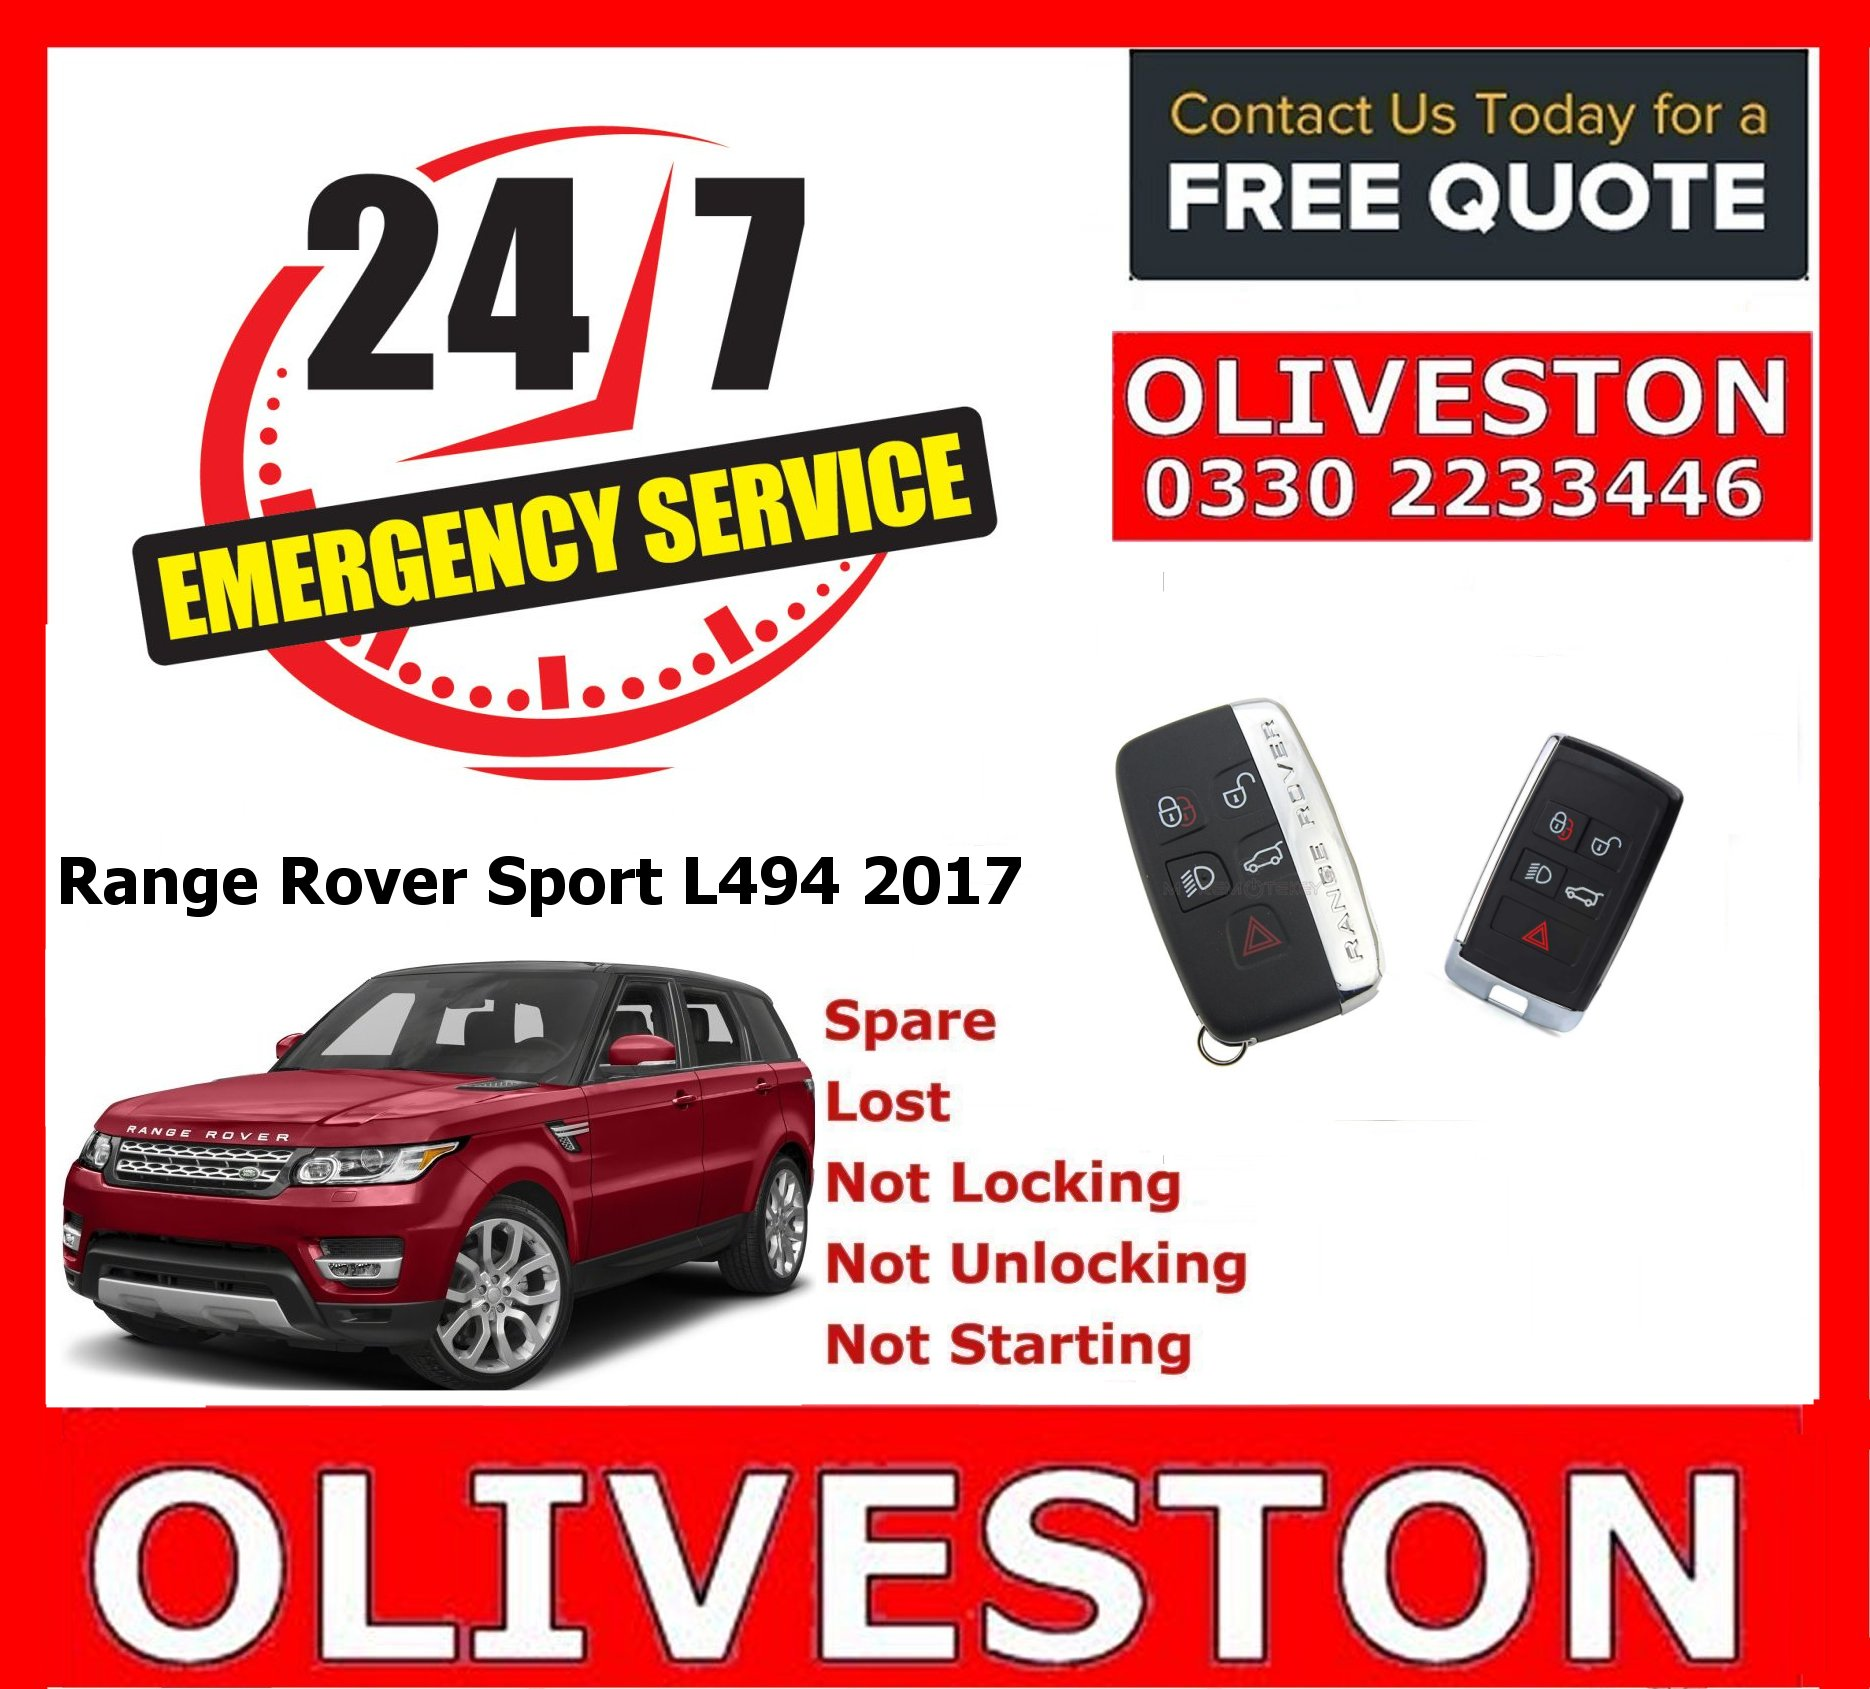 Range Rover Land Rover Jaguar Spare lost keys Aberdeen Peterhead Inverurie Fraserburgh Westhill Stonehaven Ellon Portlethen Aberdeenshire Scotland